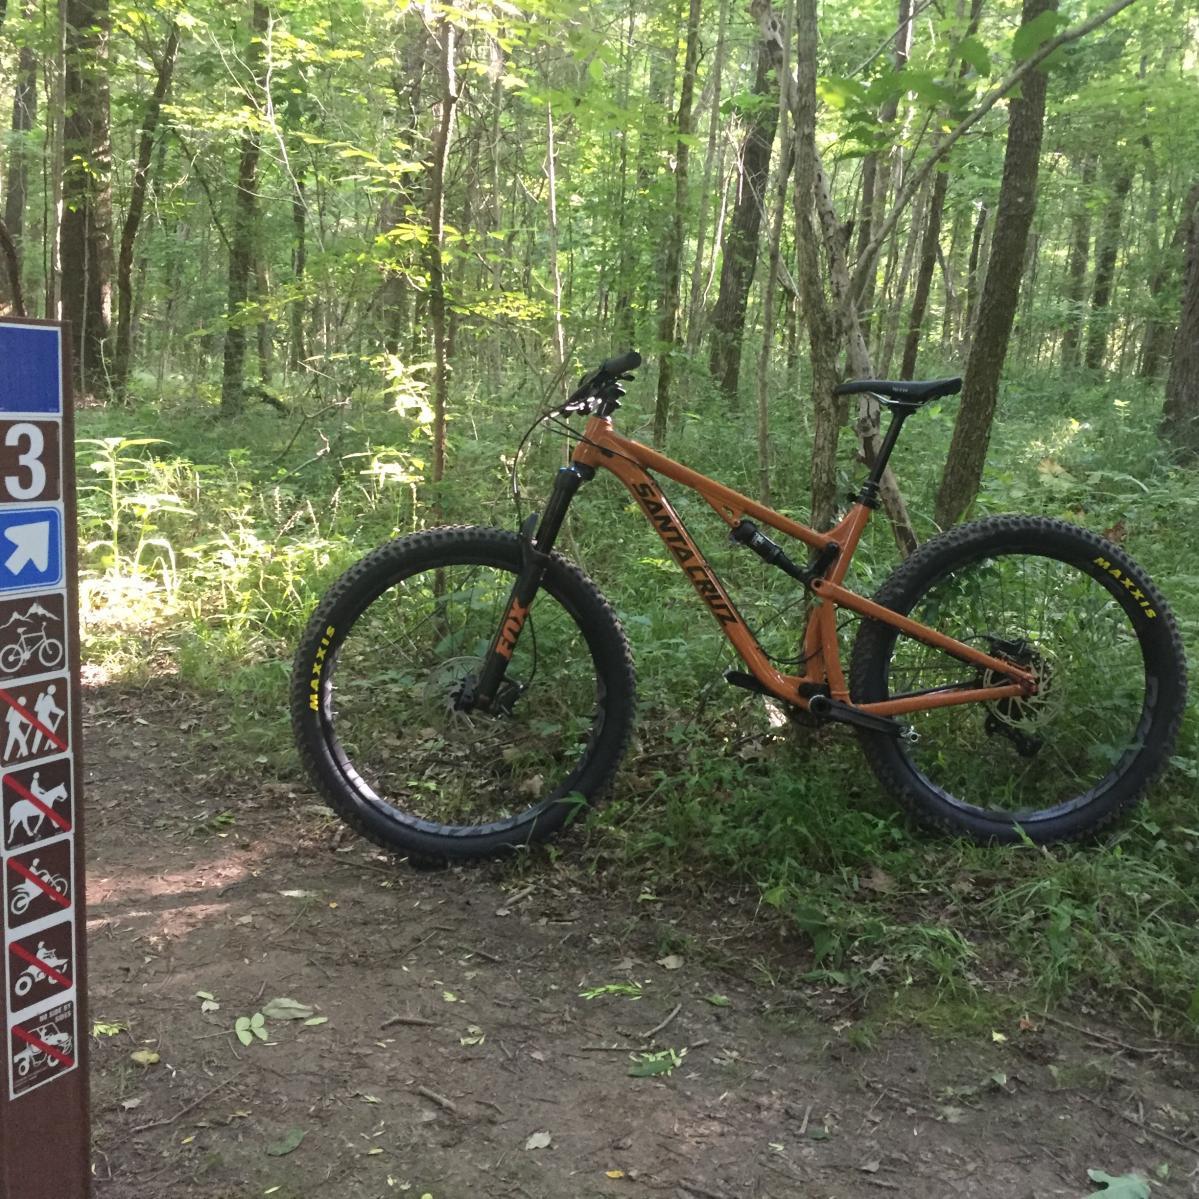 Cane Ridge Mountain Bike Trail In Antioch Tennessee Singletracks Com